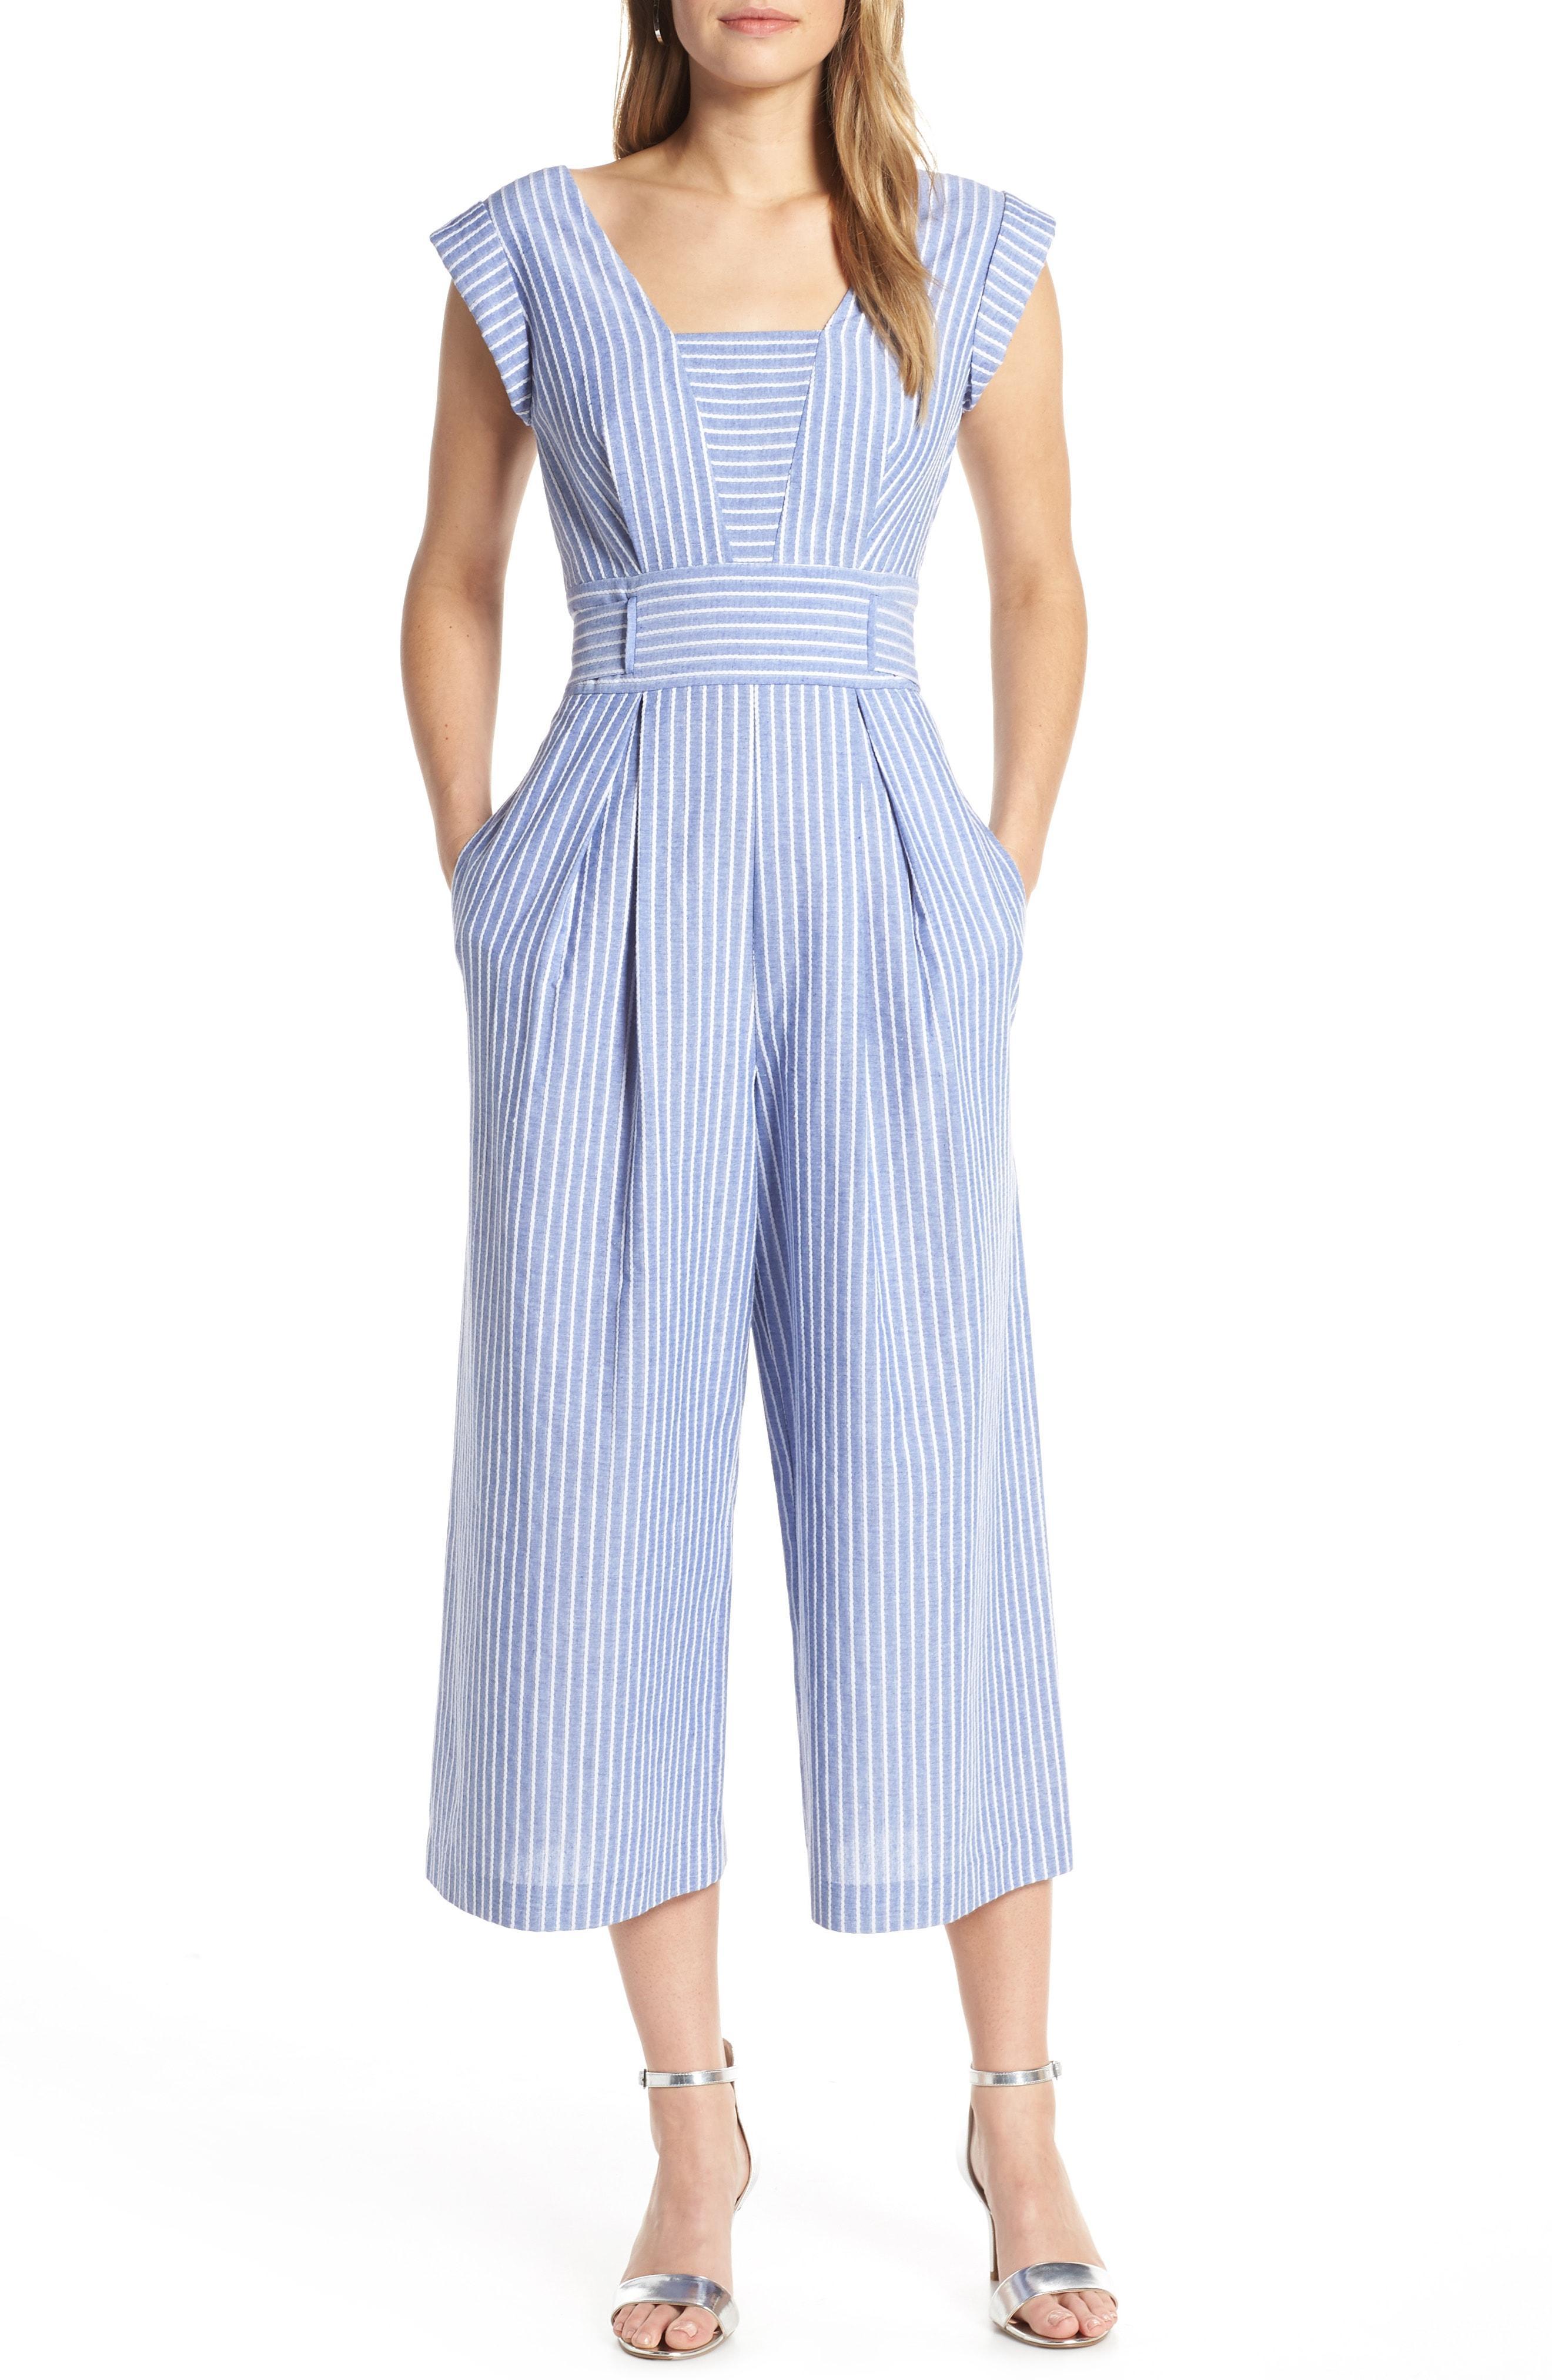 5523821611b Lyst - Nordstrom 1901 Square Neck Crop Jumpsuit in Blue